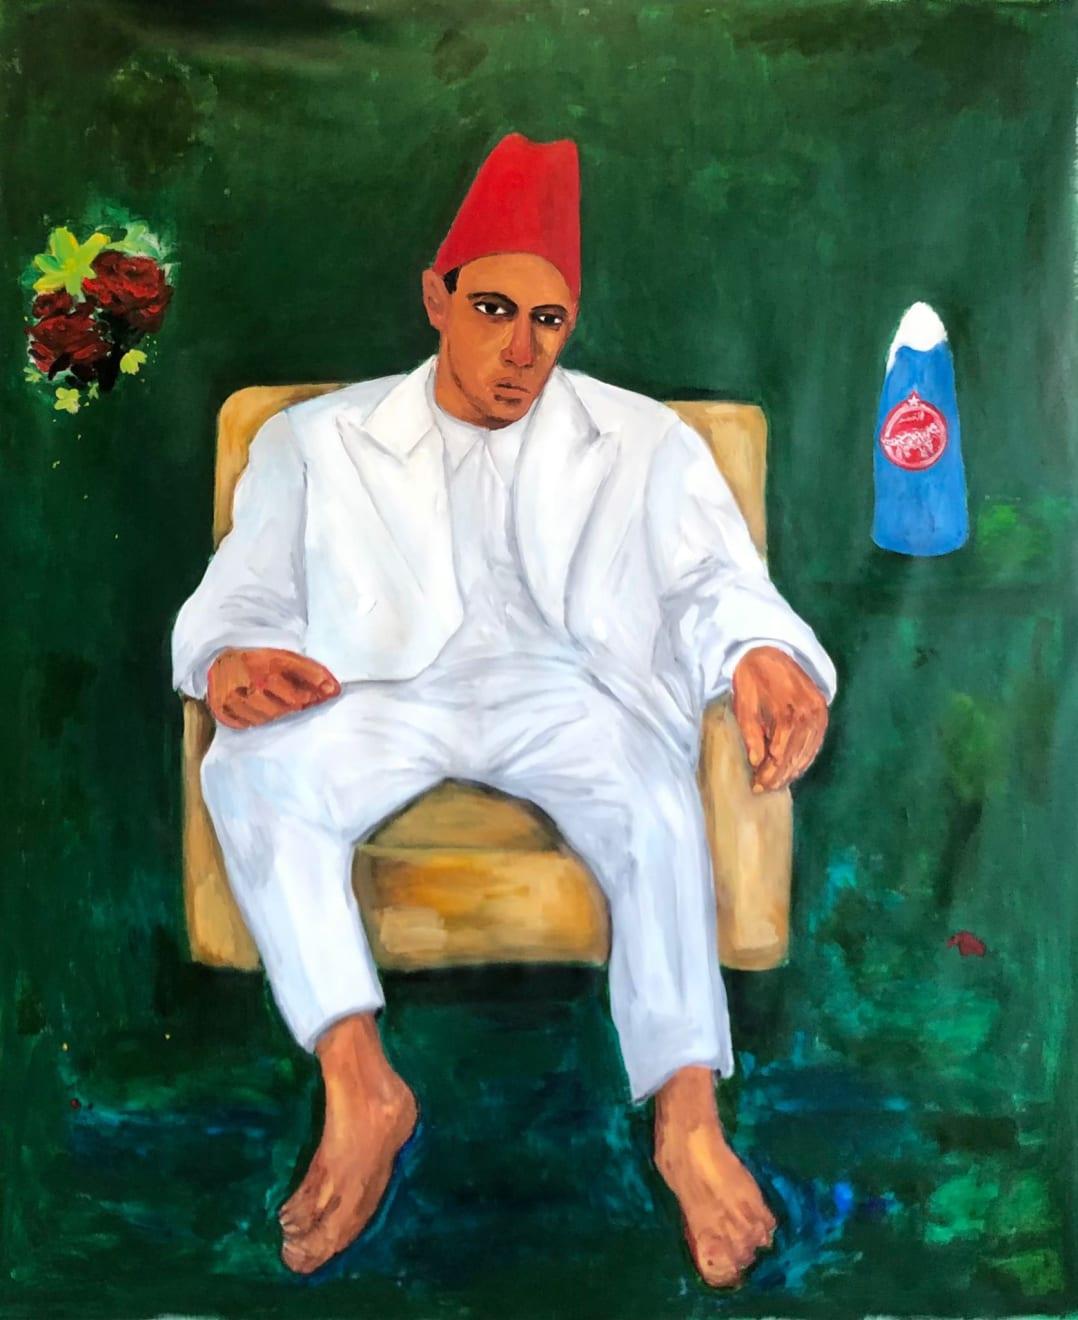 Anuar Khalifi, Na3na3, 2020, Acrylic on canvas, 193 x 158.5cm EUR 15,000 (Excluding VAT)